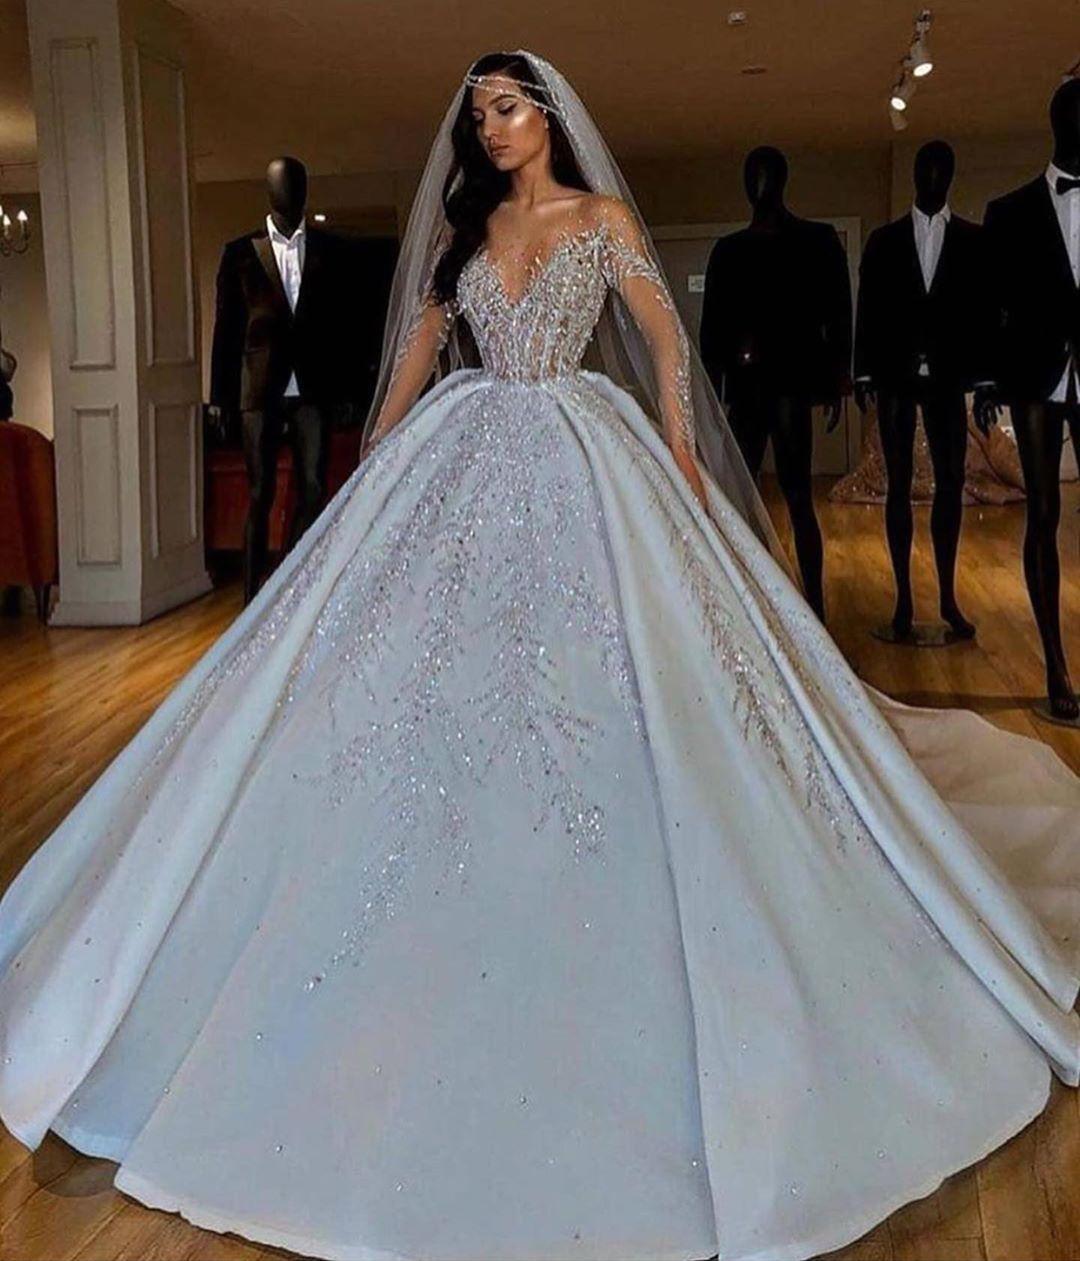 Long Sleeve Wedding Dresses Bridal Gowns With Sleeves White Ball Gowns Ball Gowns Wedding Sheer Wedding Dress [ 1261 x 1080 Pixel ]